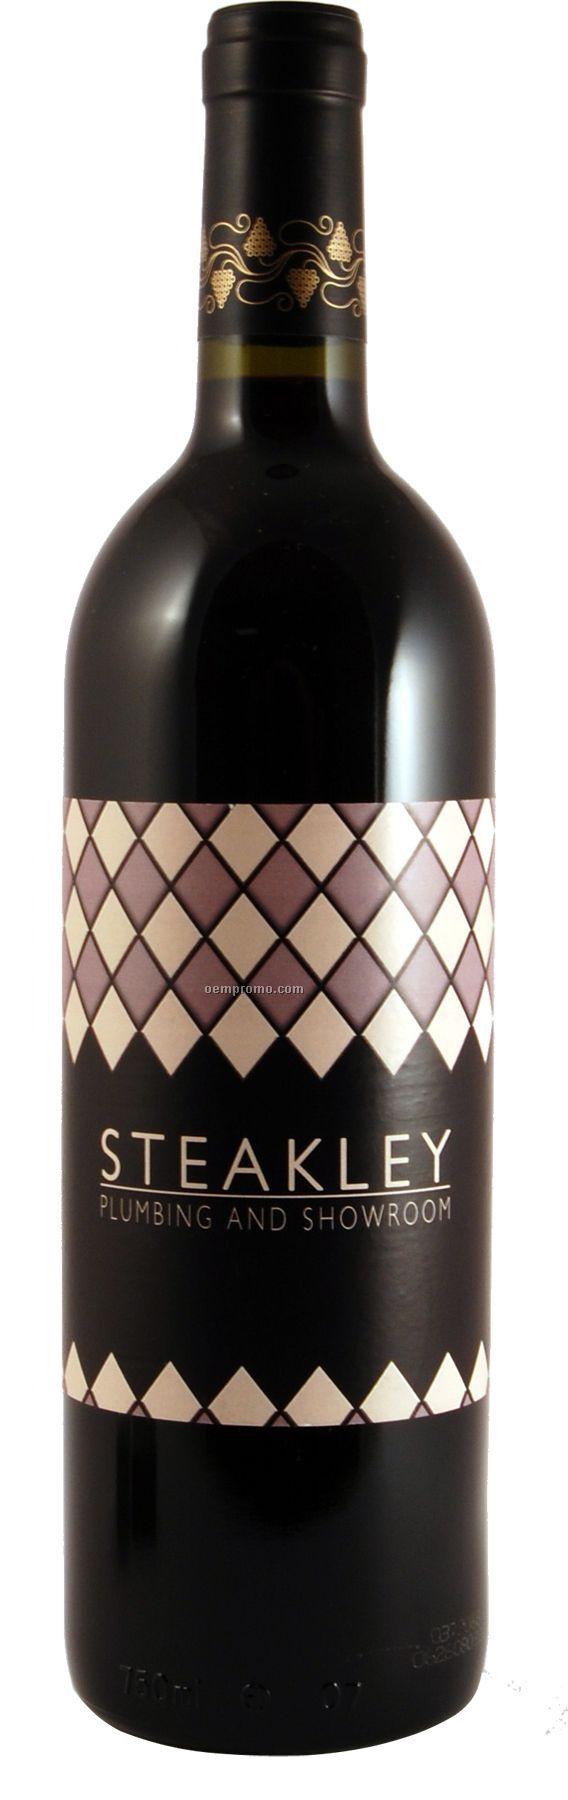 2008 Wv Merlot, Alexander Valley, Private Reserve (Custom Labeled Wine)